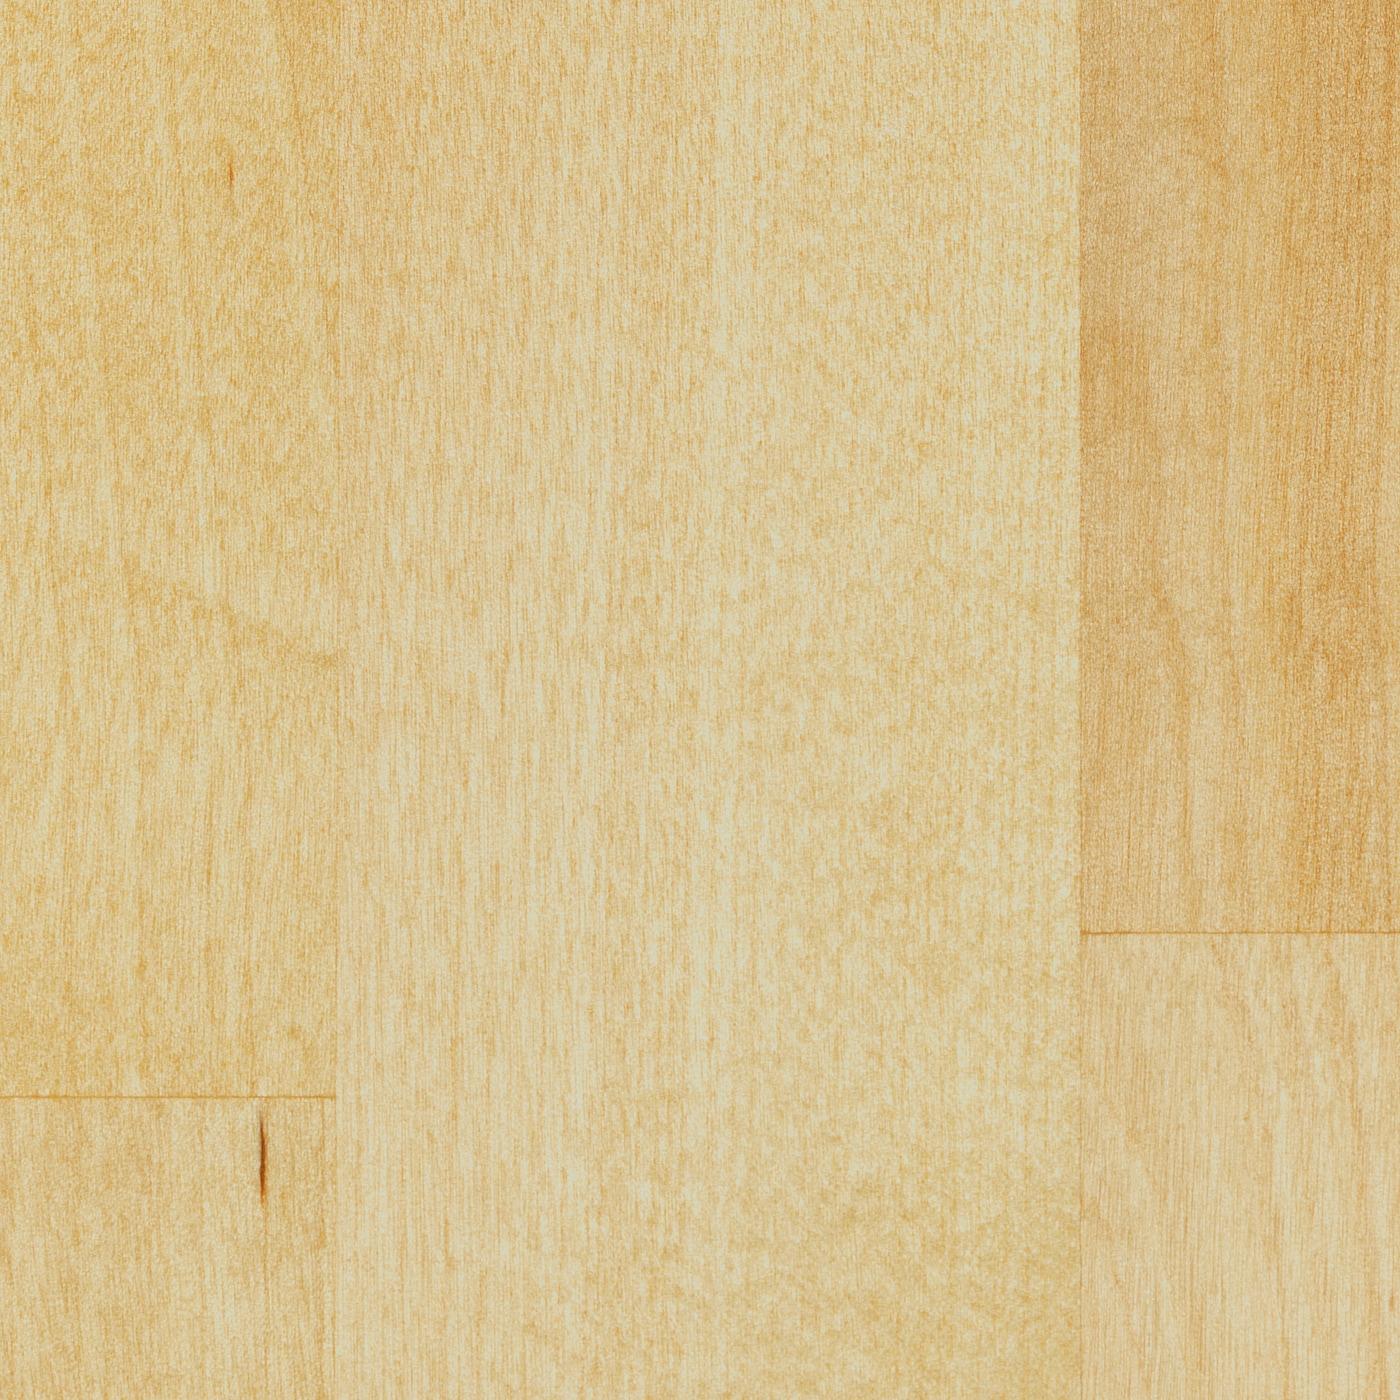 KARLBY Worktop - birch/veneer 186x3.8 cm